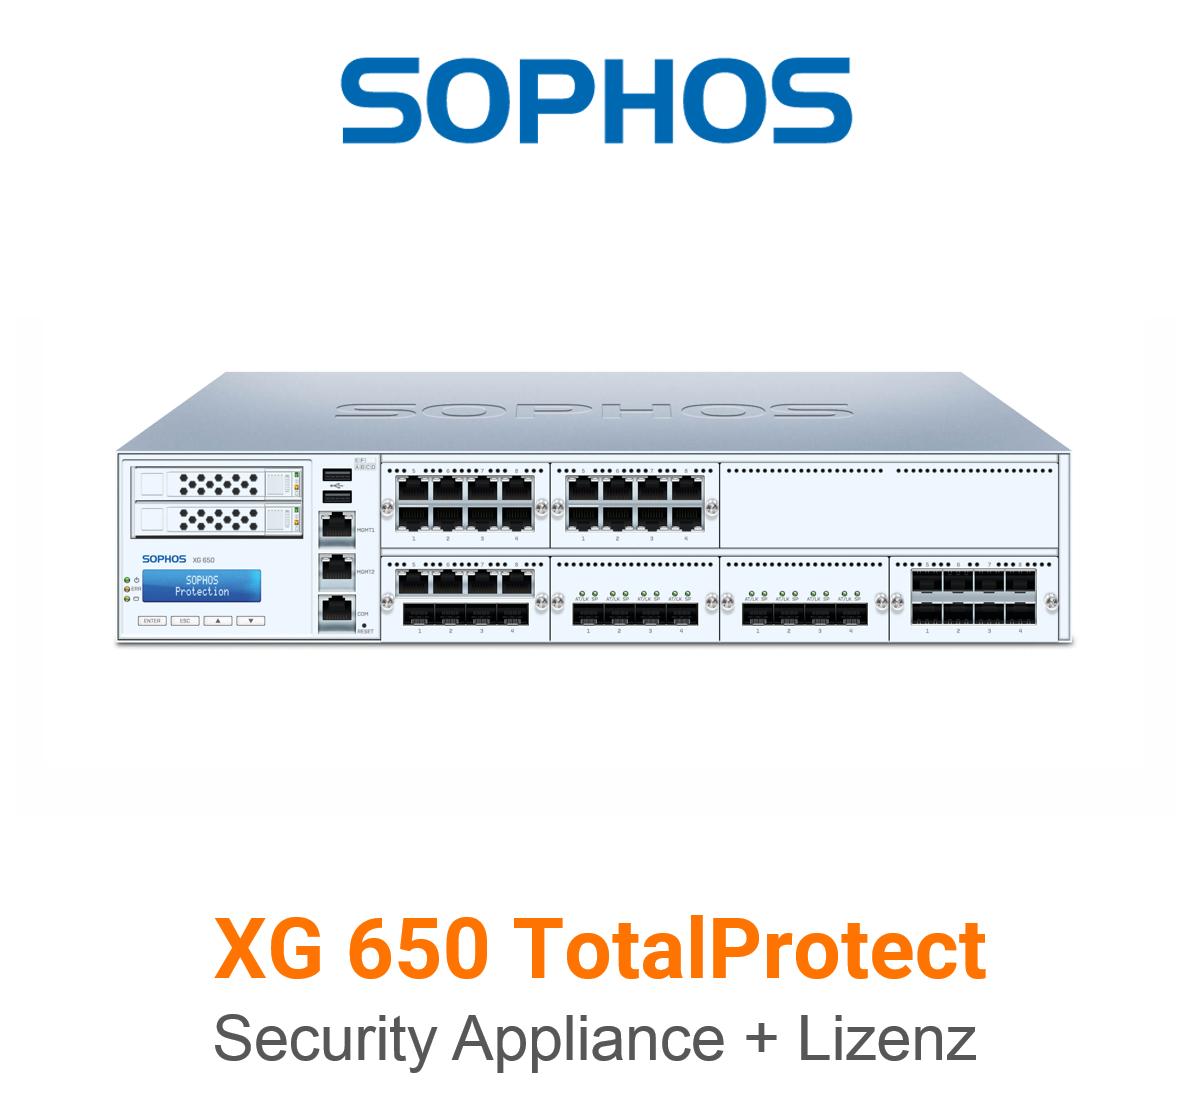 Sophos XG 650 TotalProtect Bundle (Hardware + Lizenz)